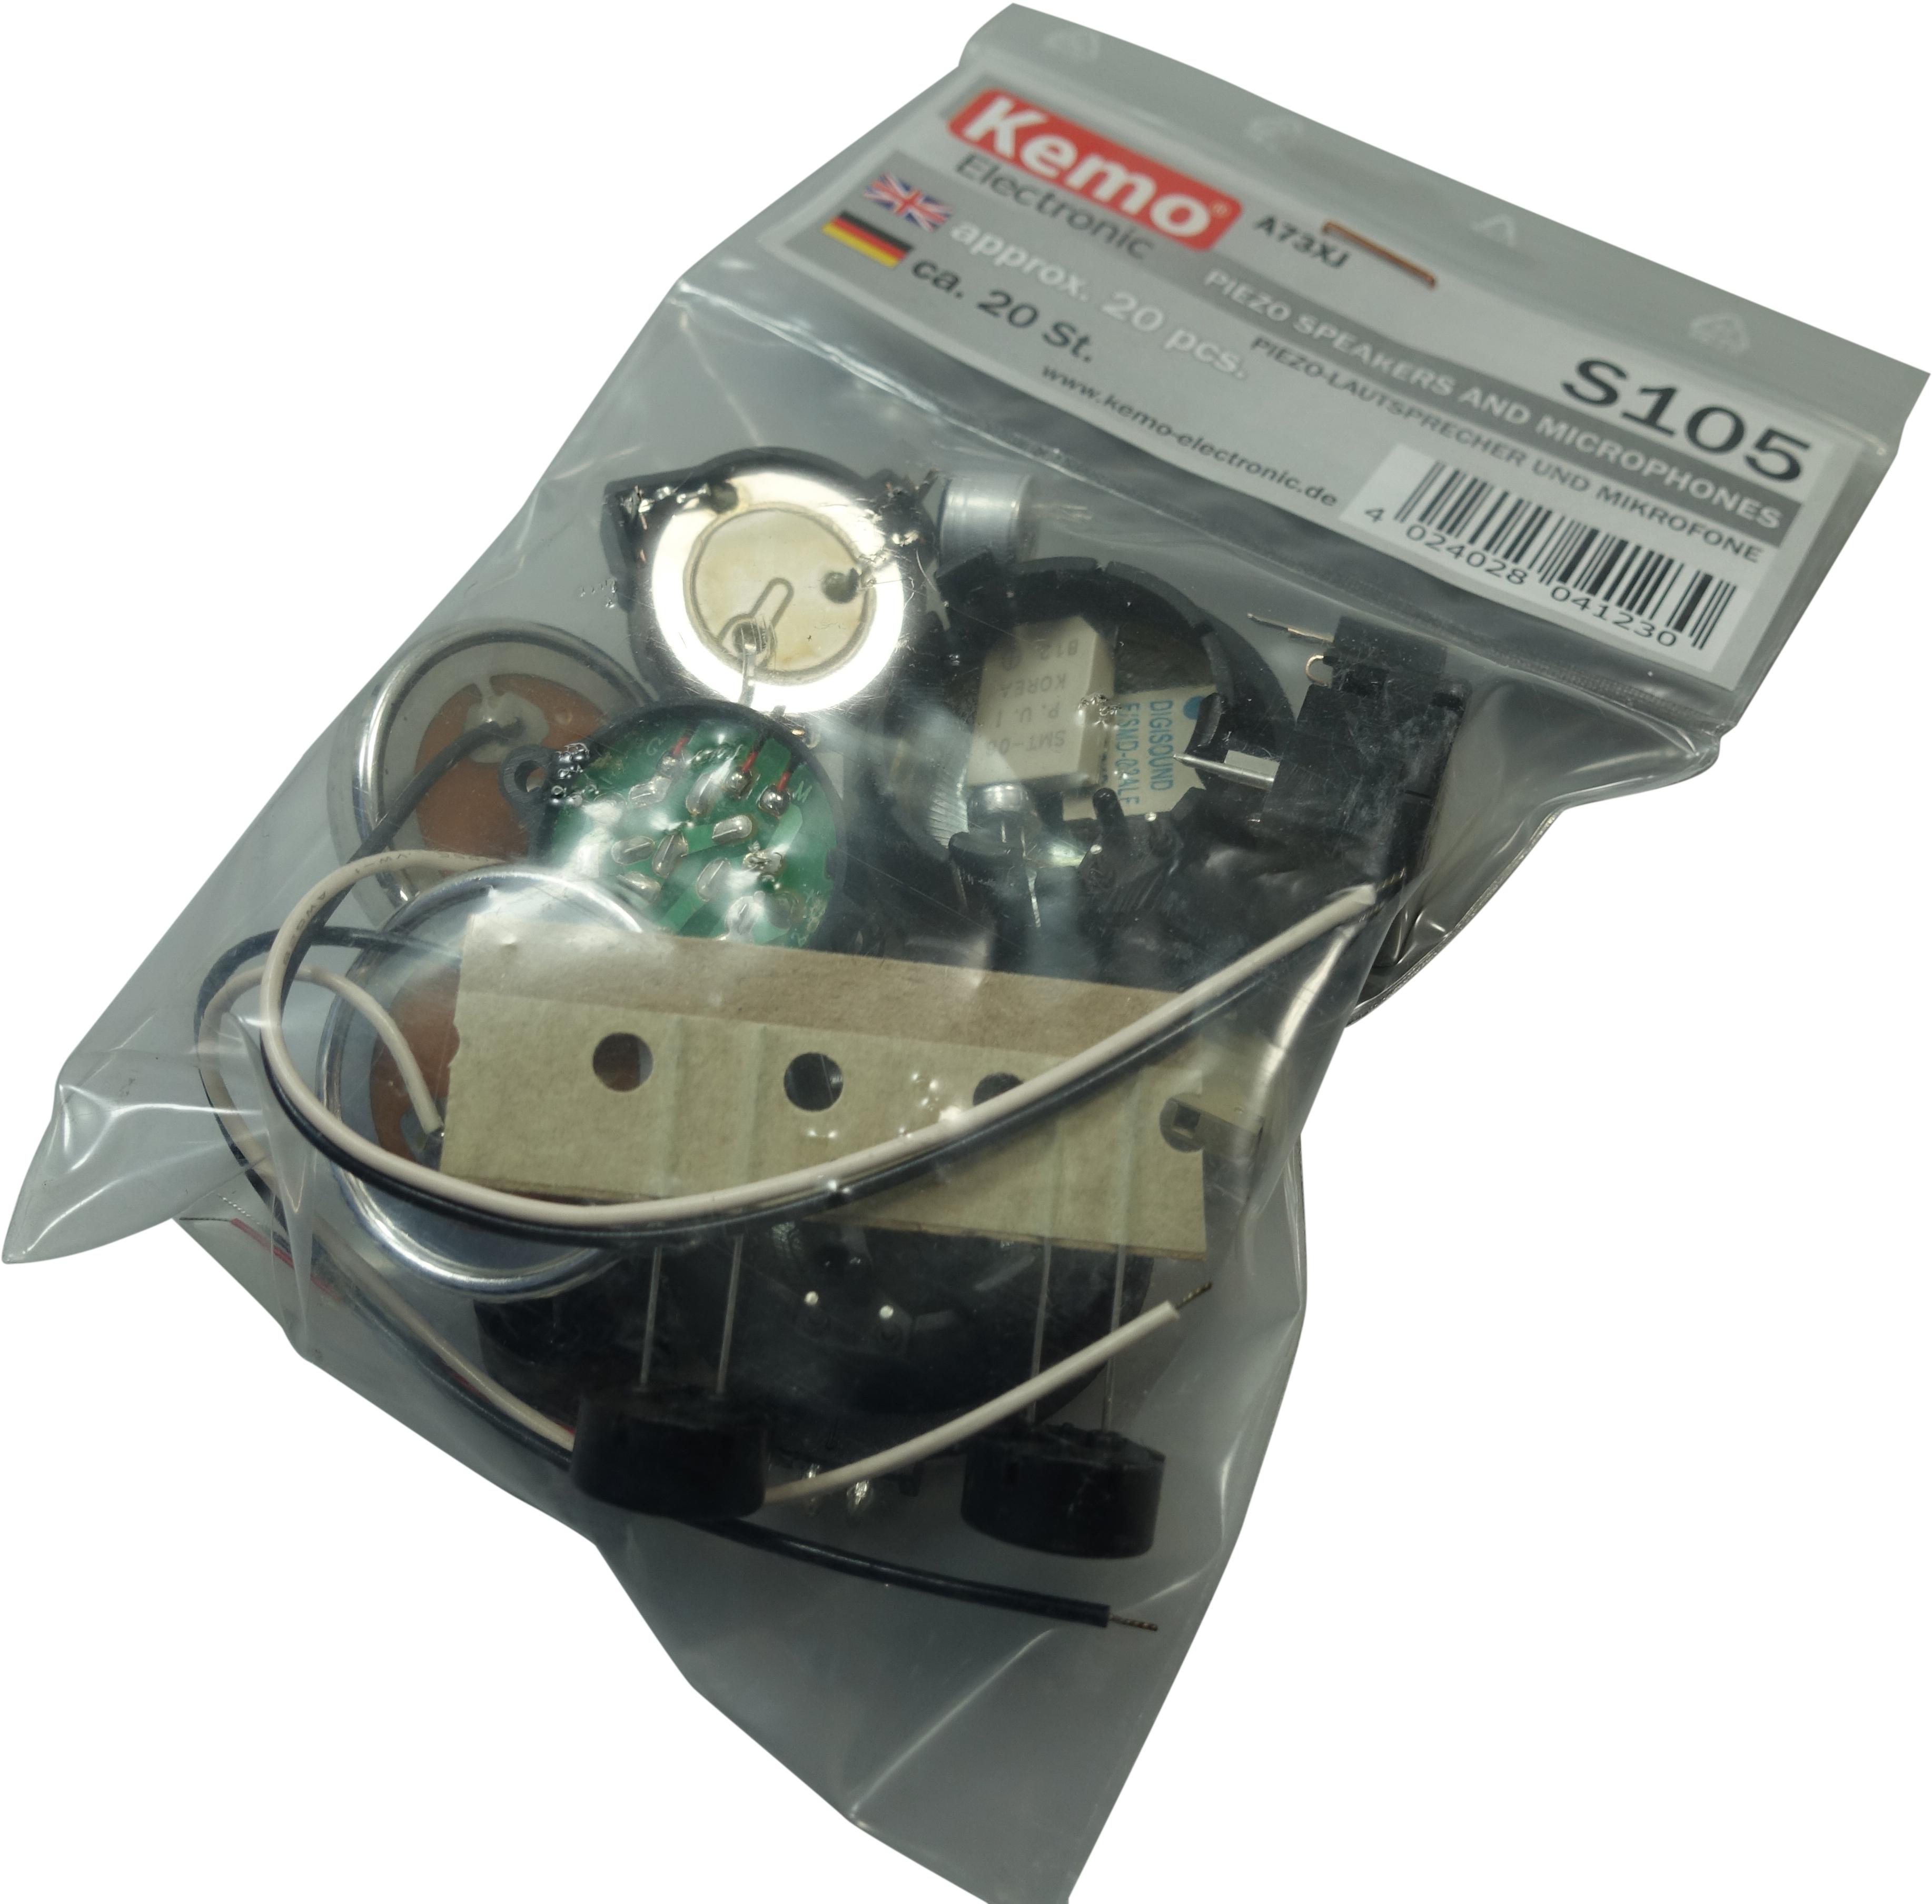 Piezo Speaker and Microphone Pack